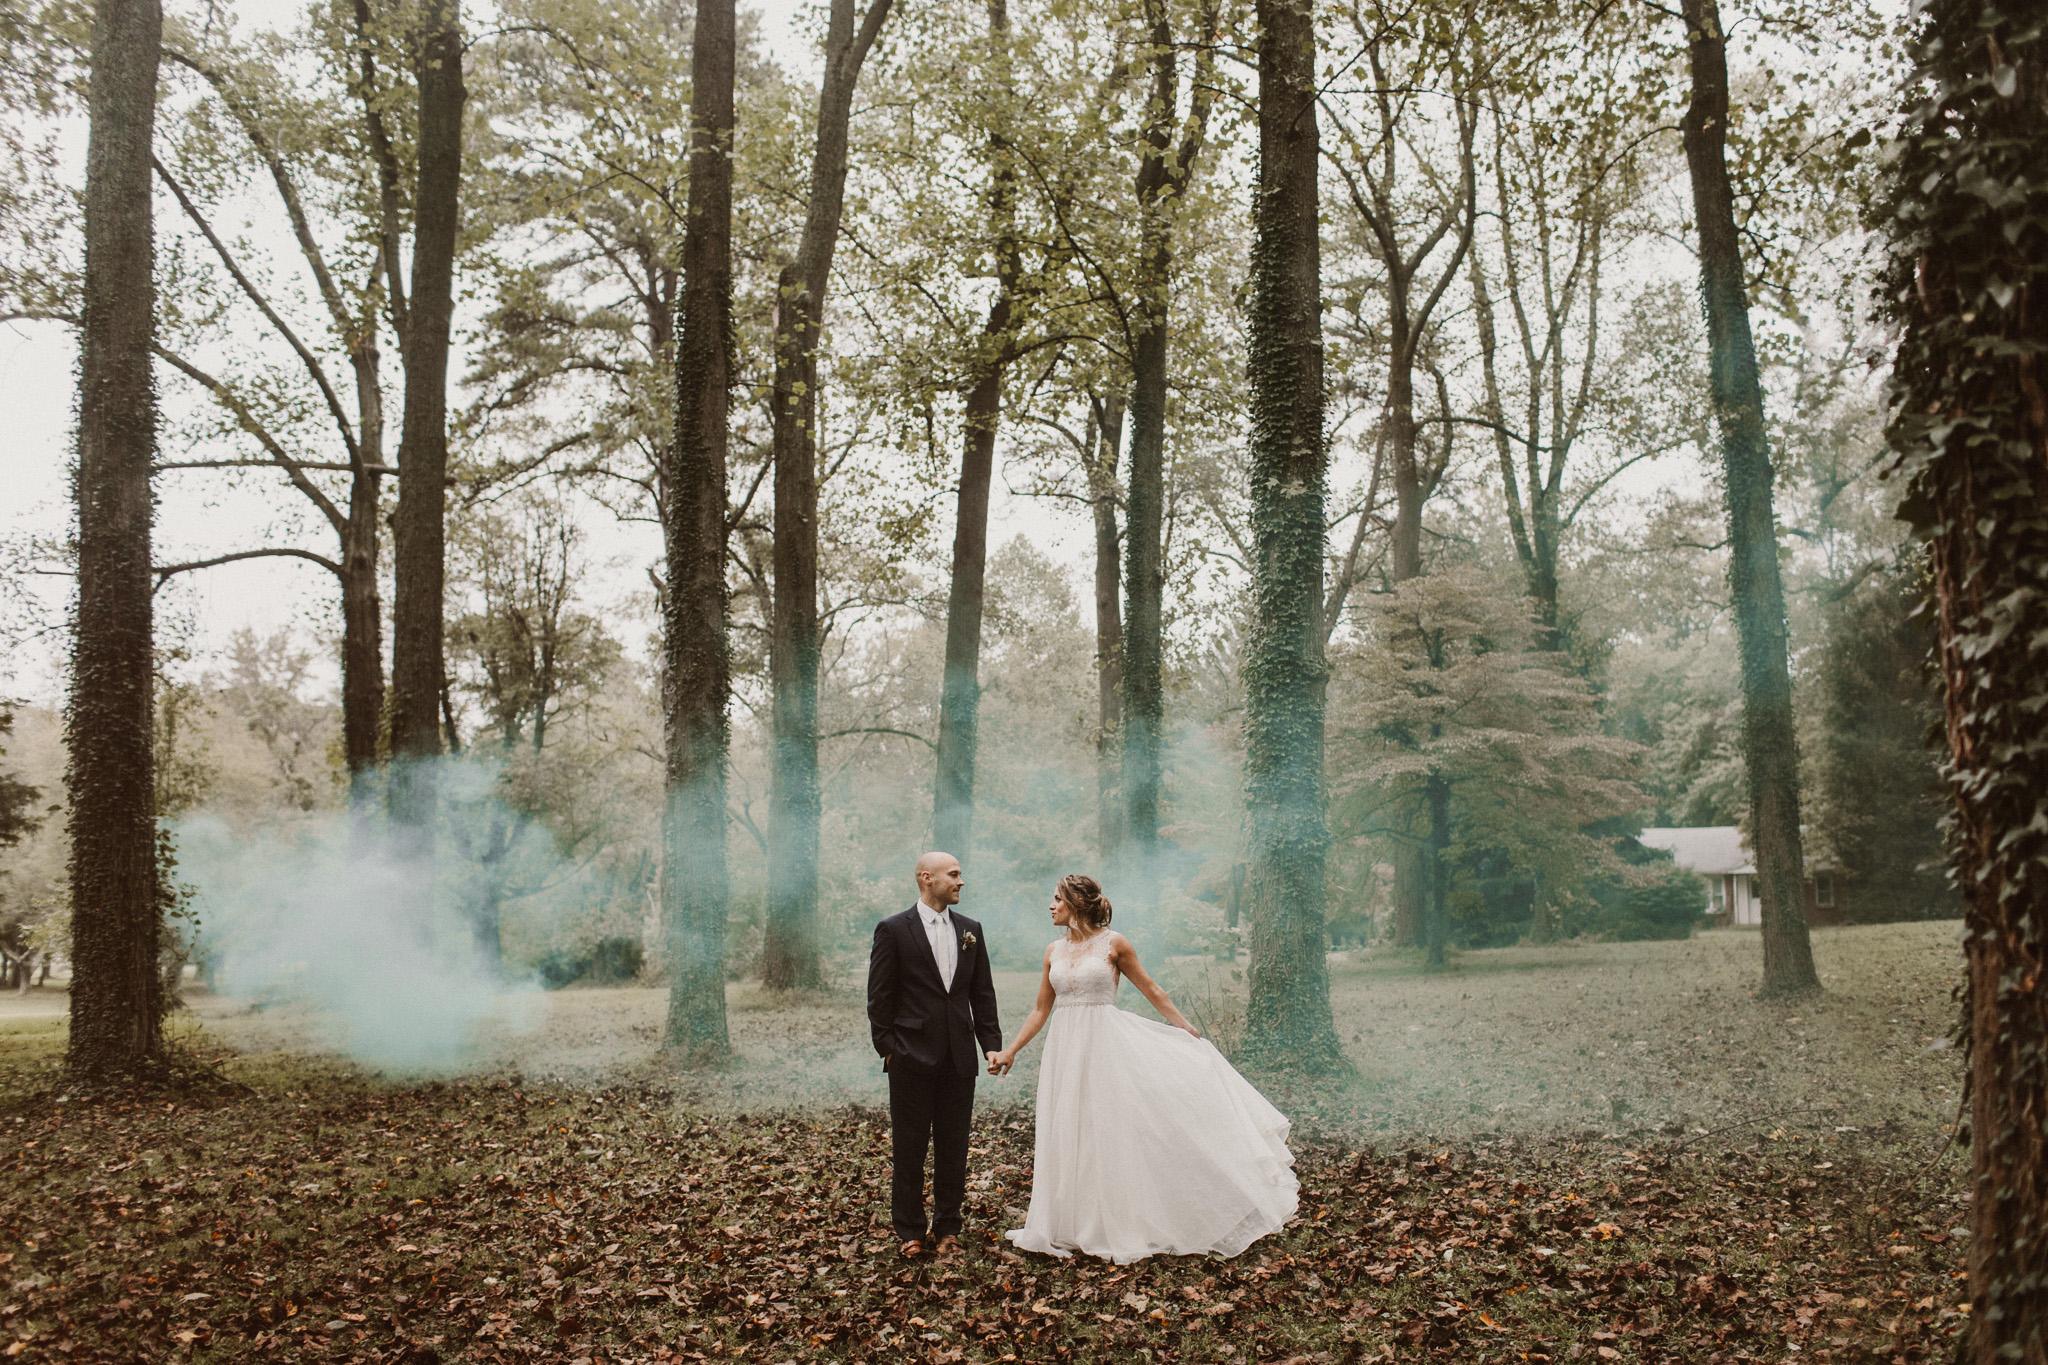 Maryland wedding photographer educational blog post | camera gear bag | smoke bomb wedding photography